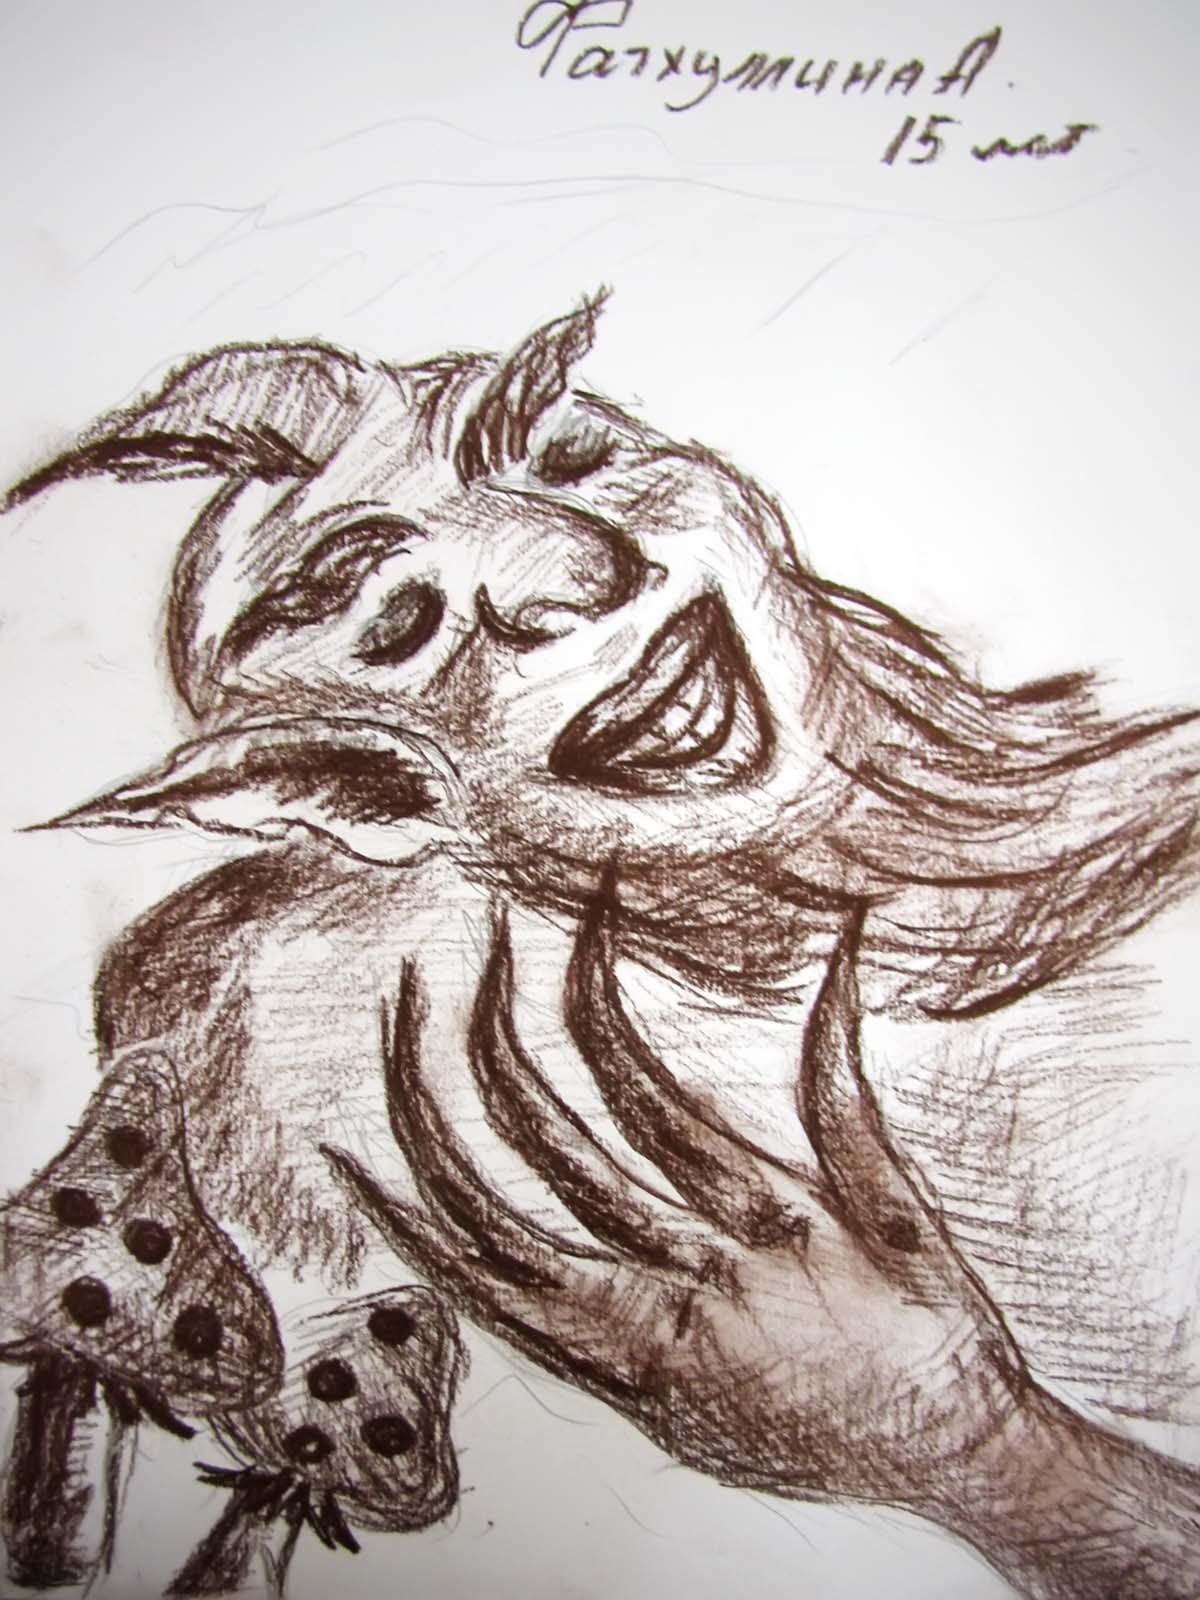 Фото №41105. Шурале. Рисунок Фатхуллиной А, 15 лет